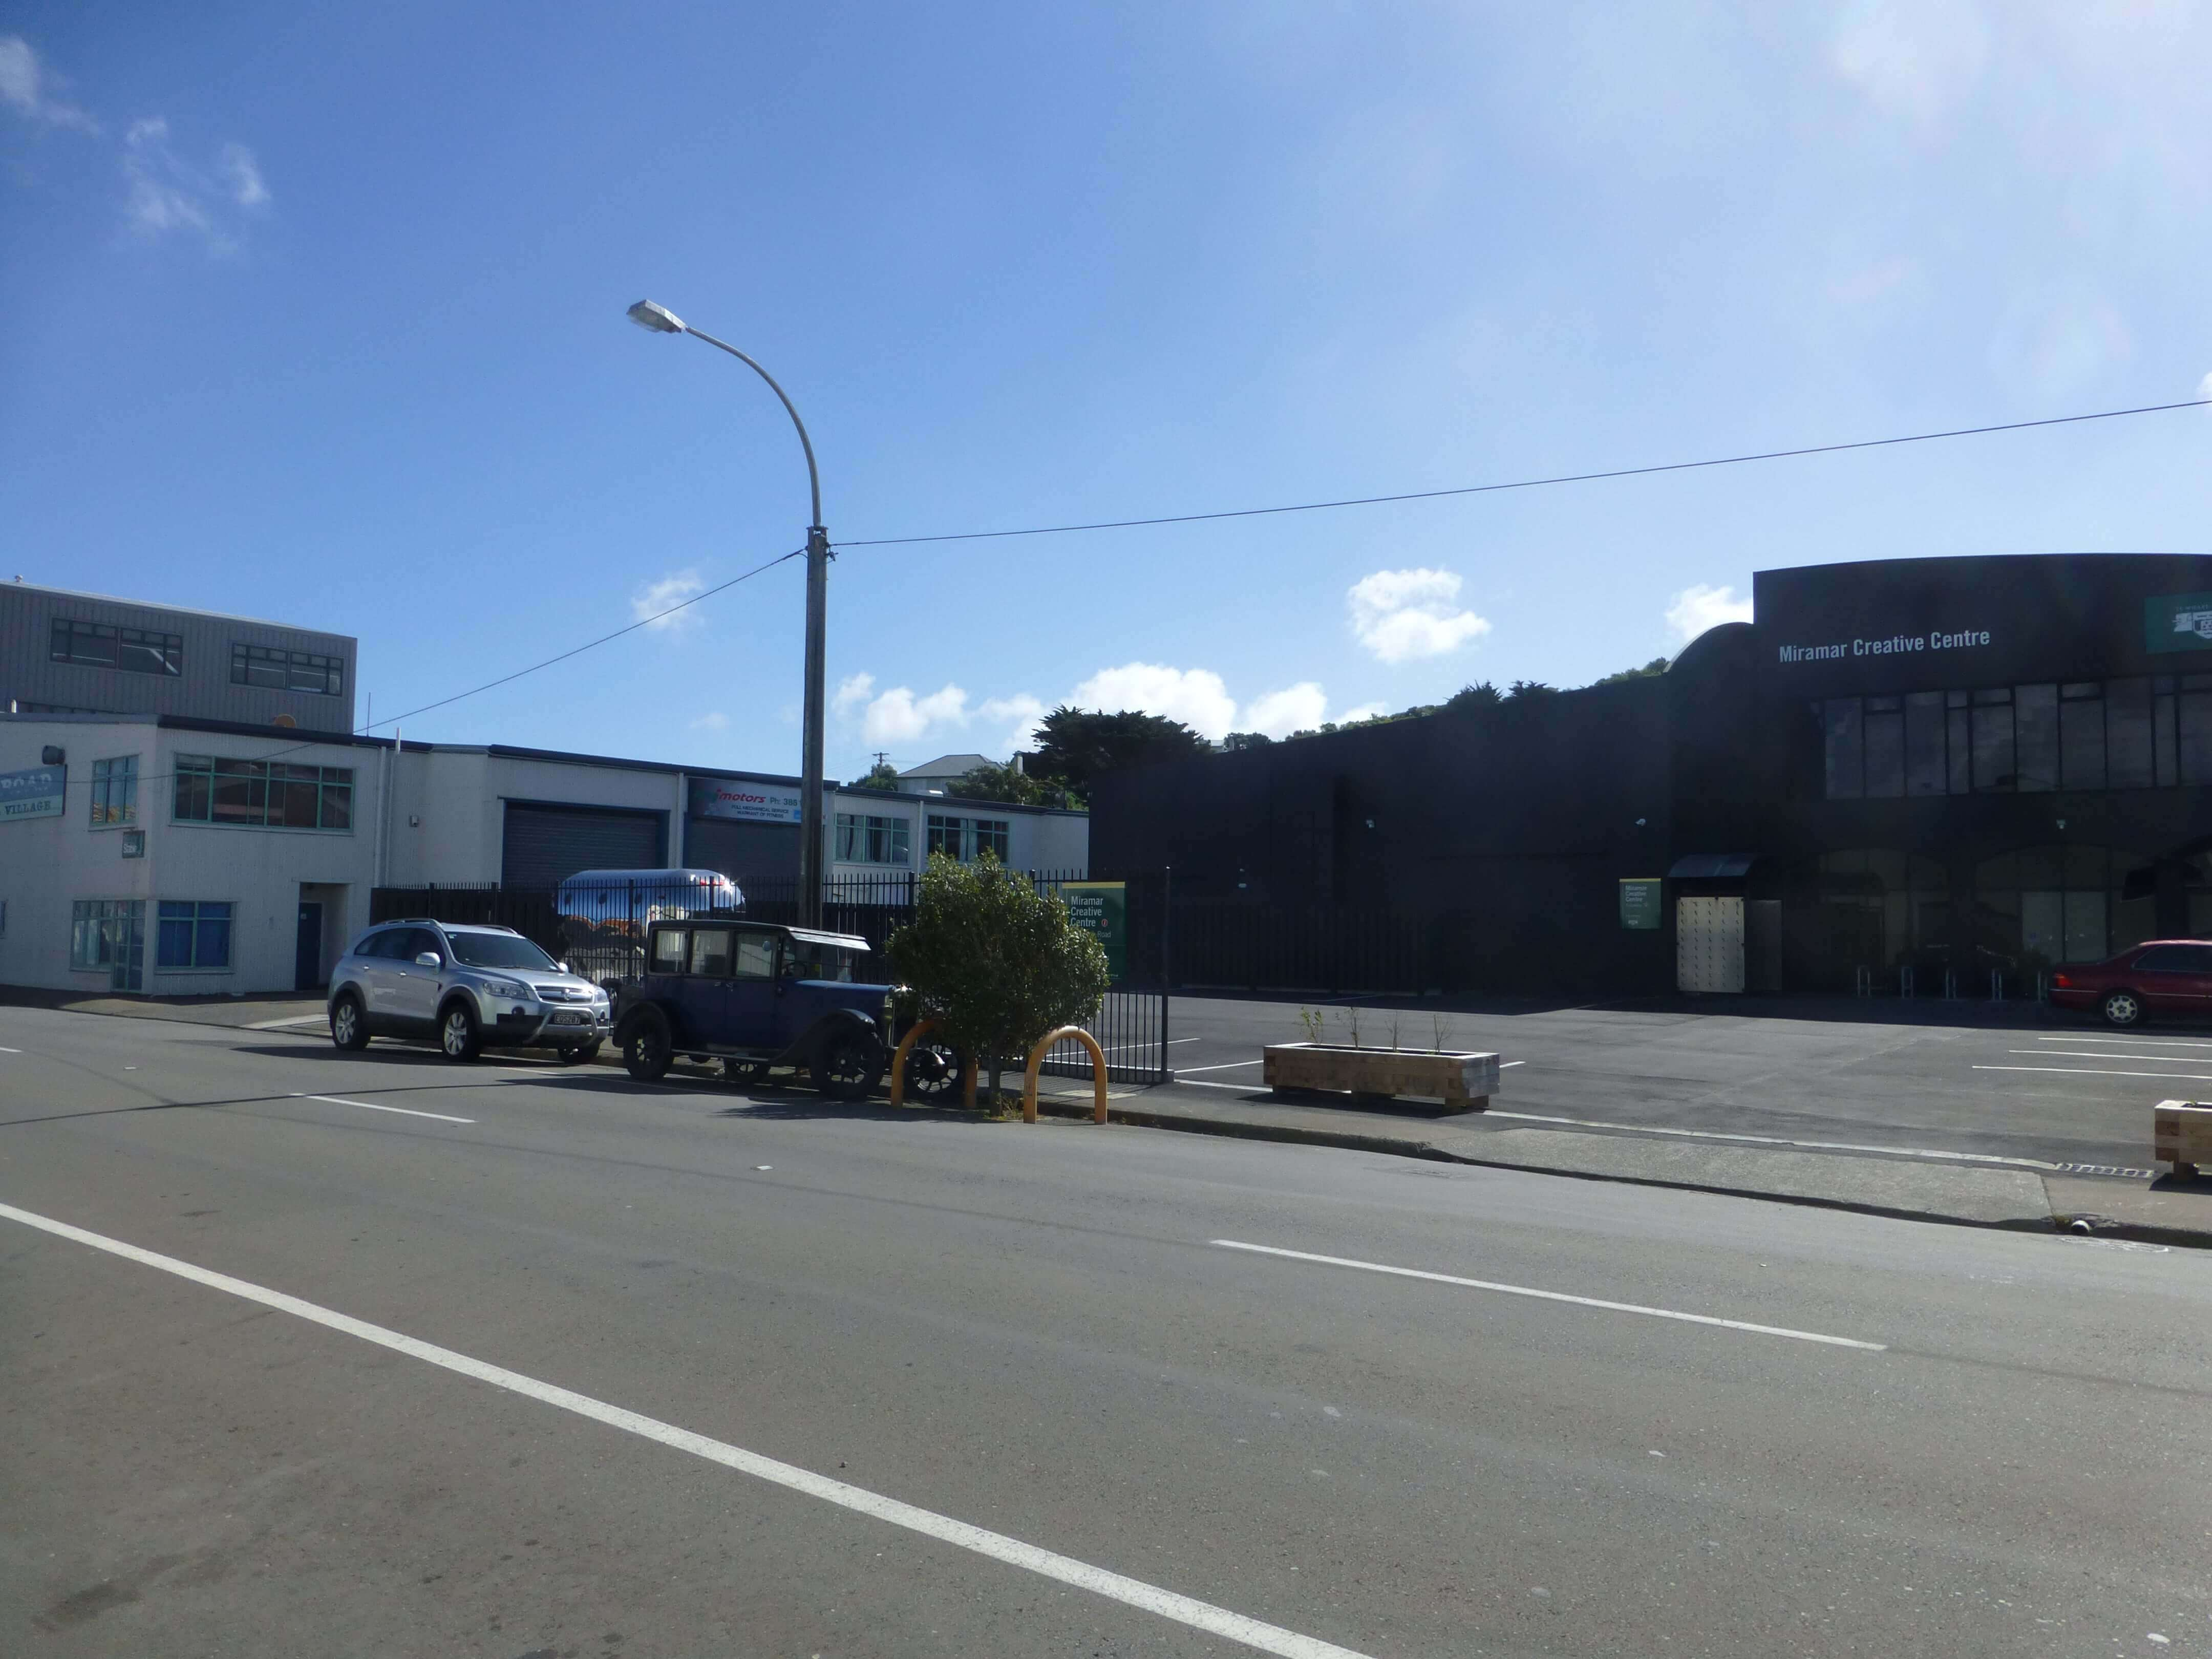 Wellington, in Miramar auf dem Weg zum Weta Shop, Weit-weg.reisen, 14